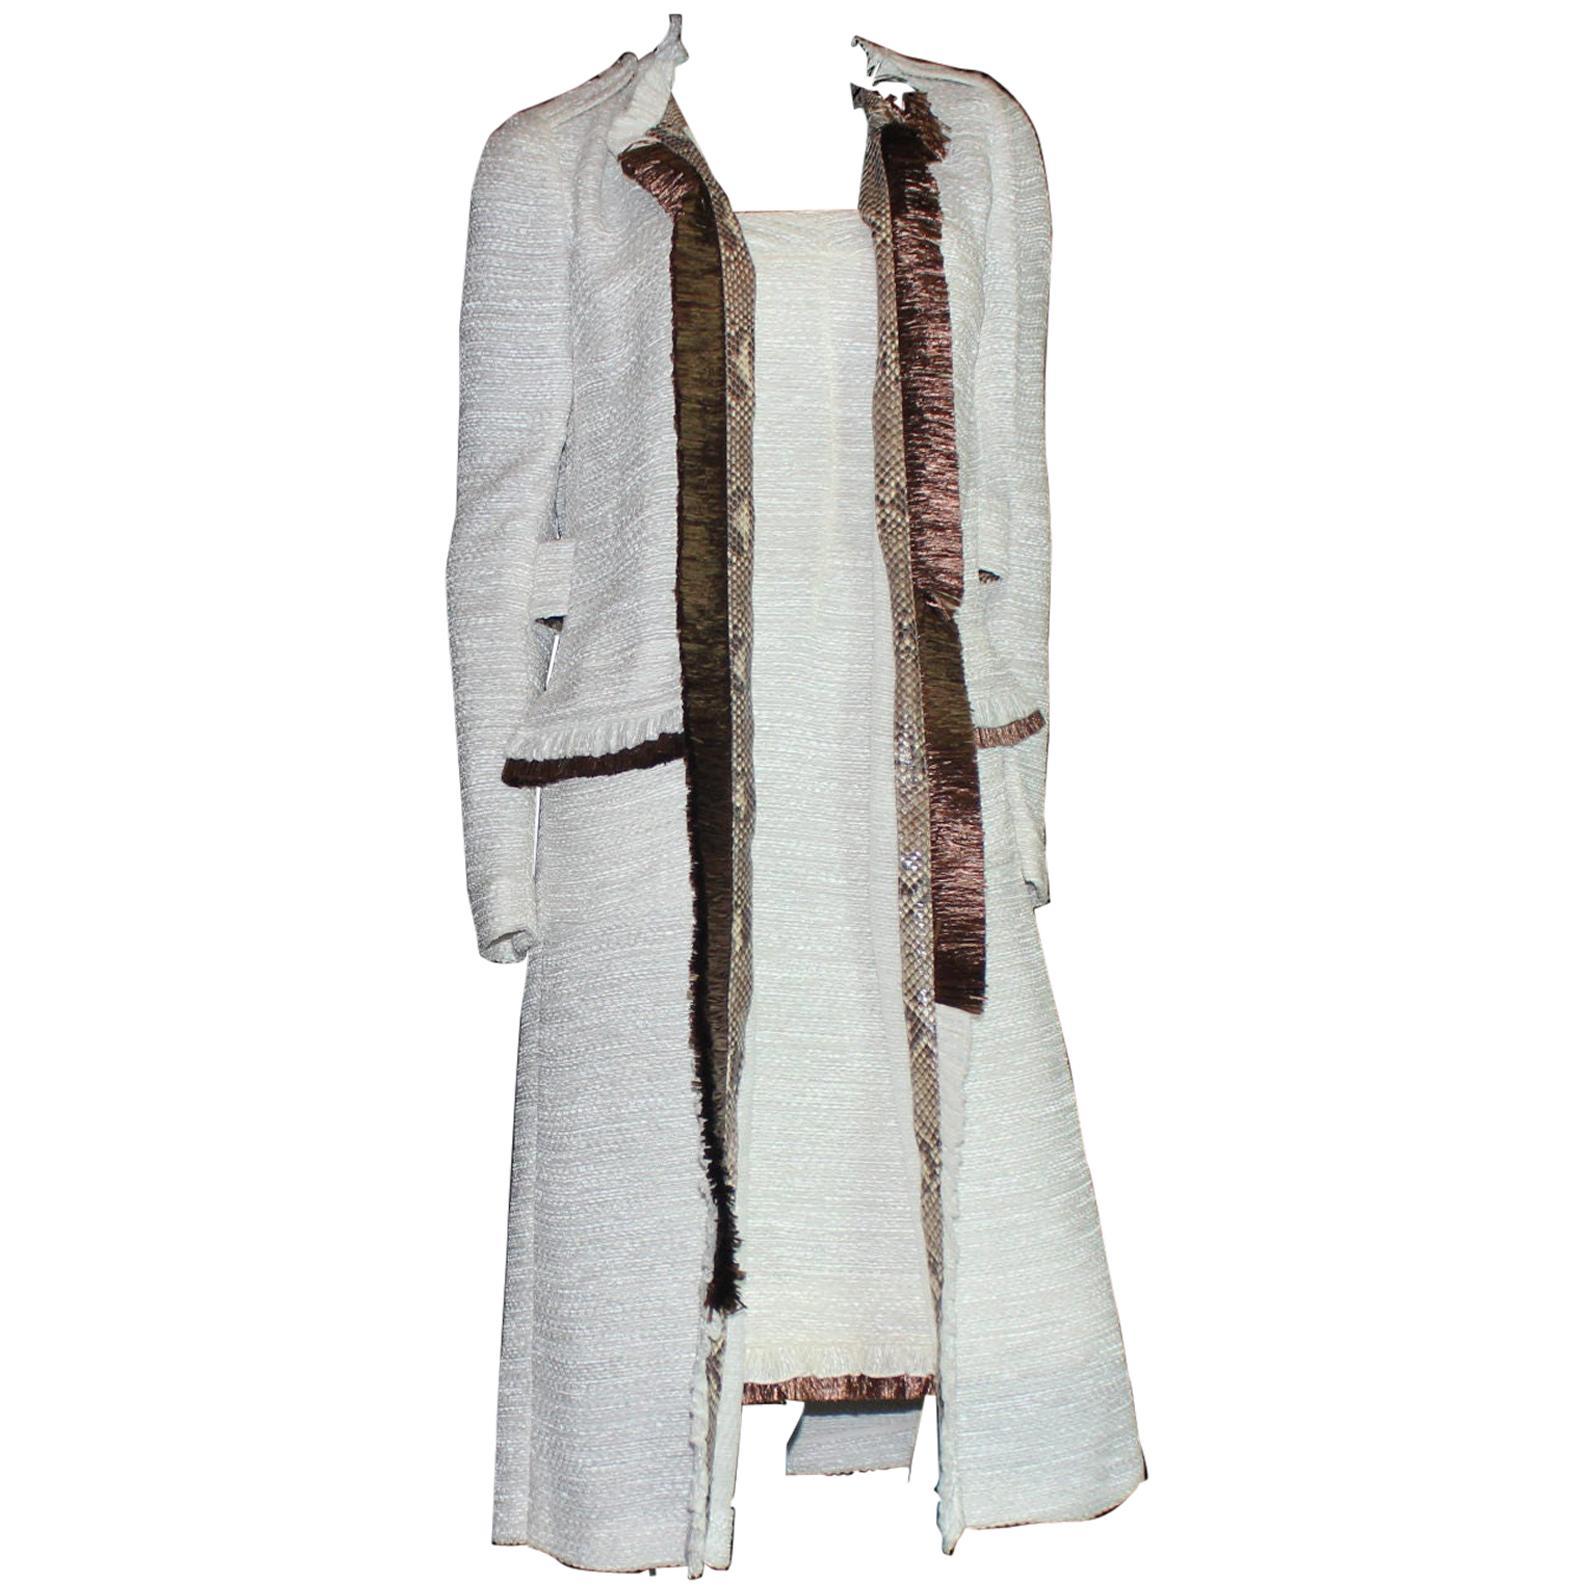 NEW Dolce Gabbana Corset Dress & Coat Suit Ensemble Frayed Python Trimming